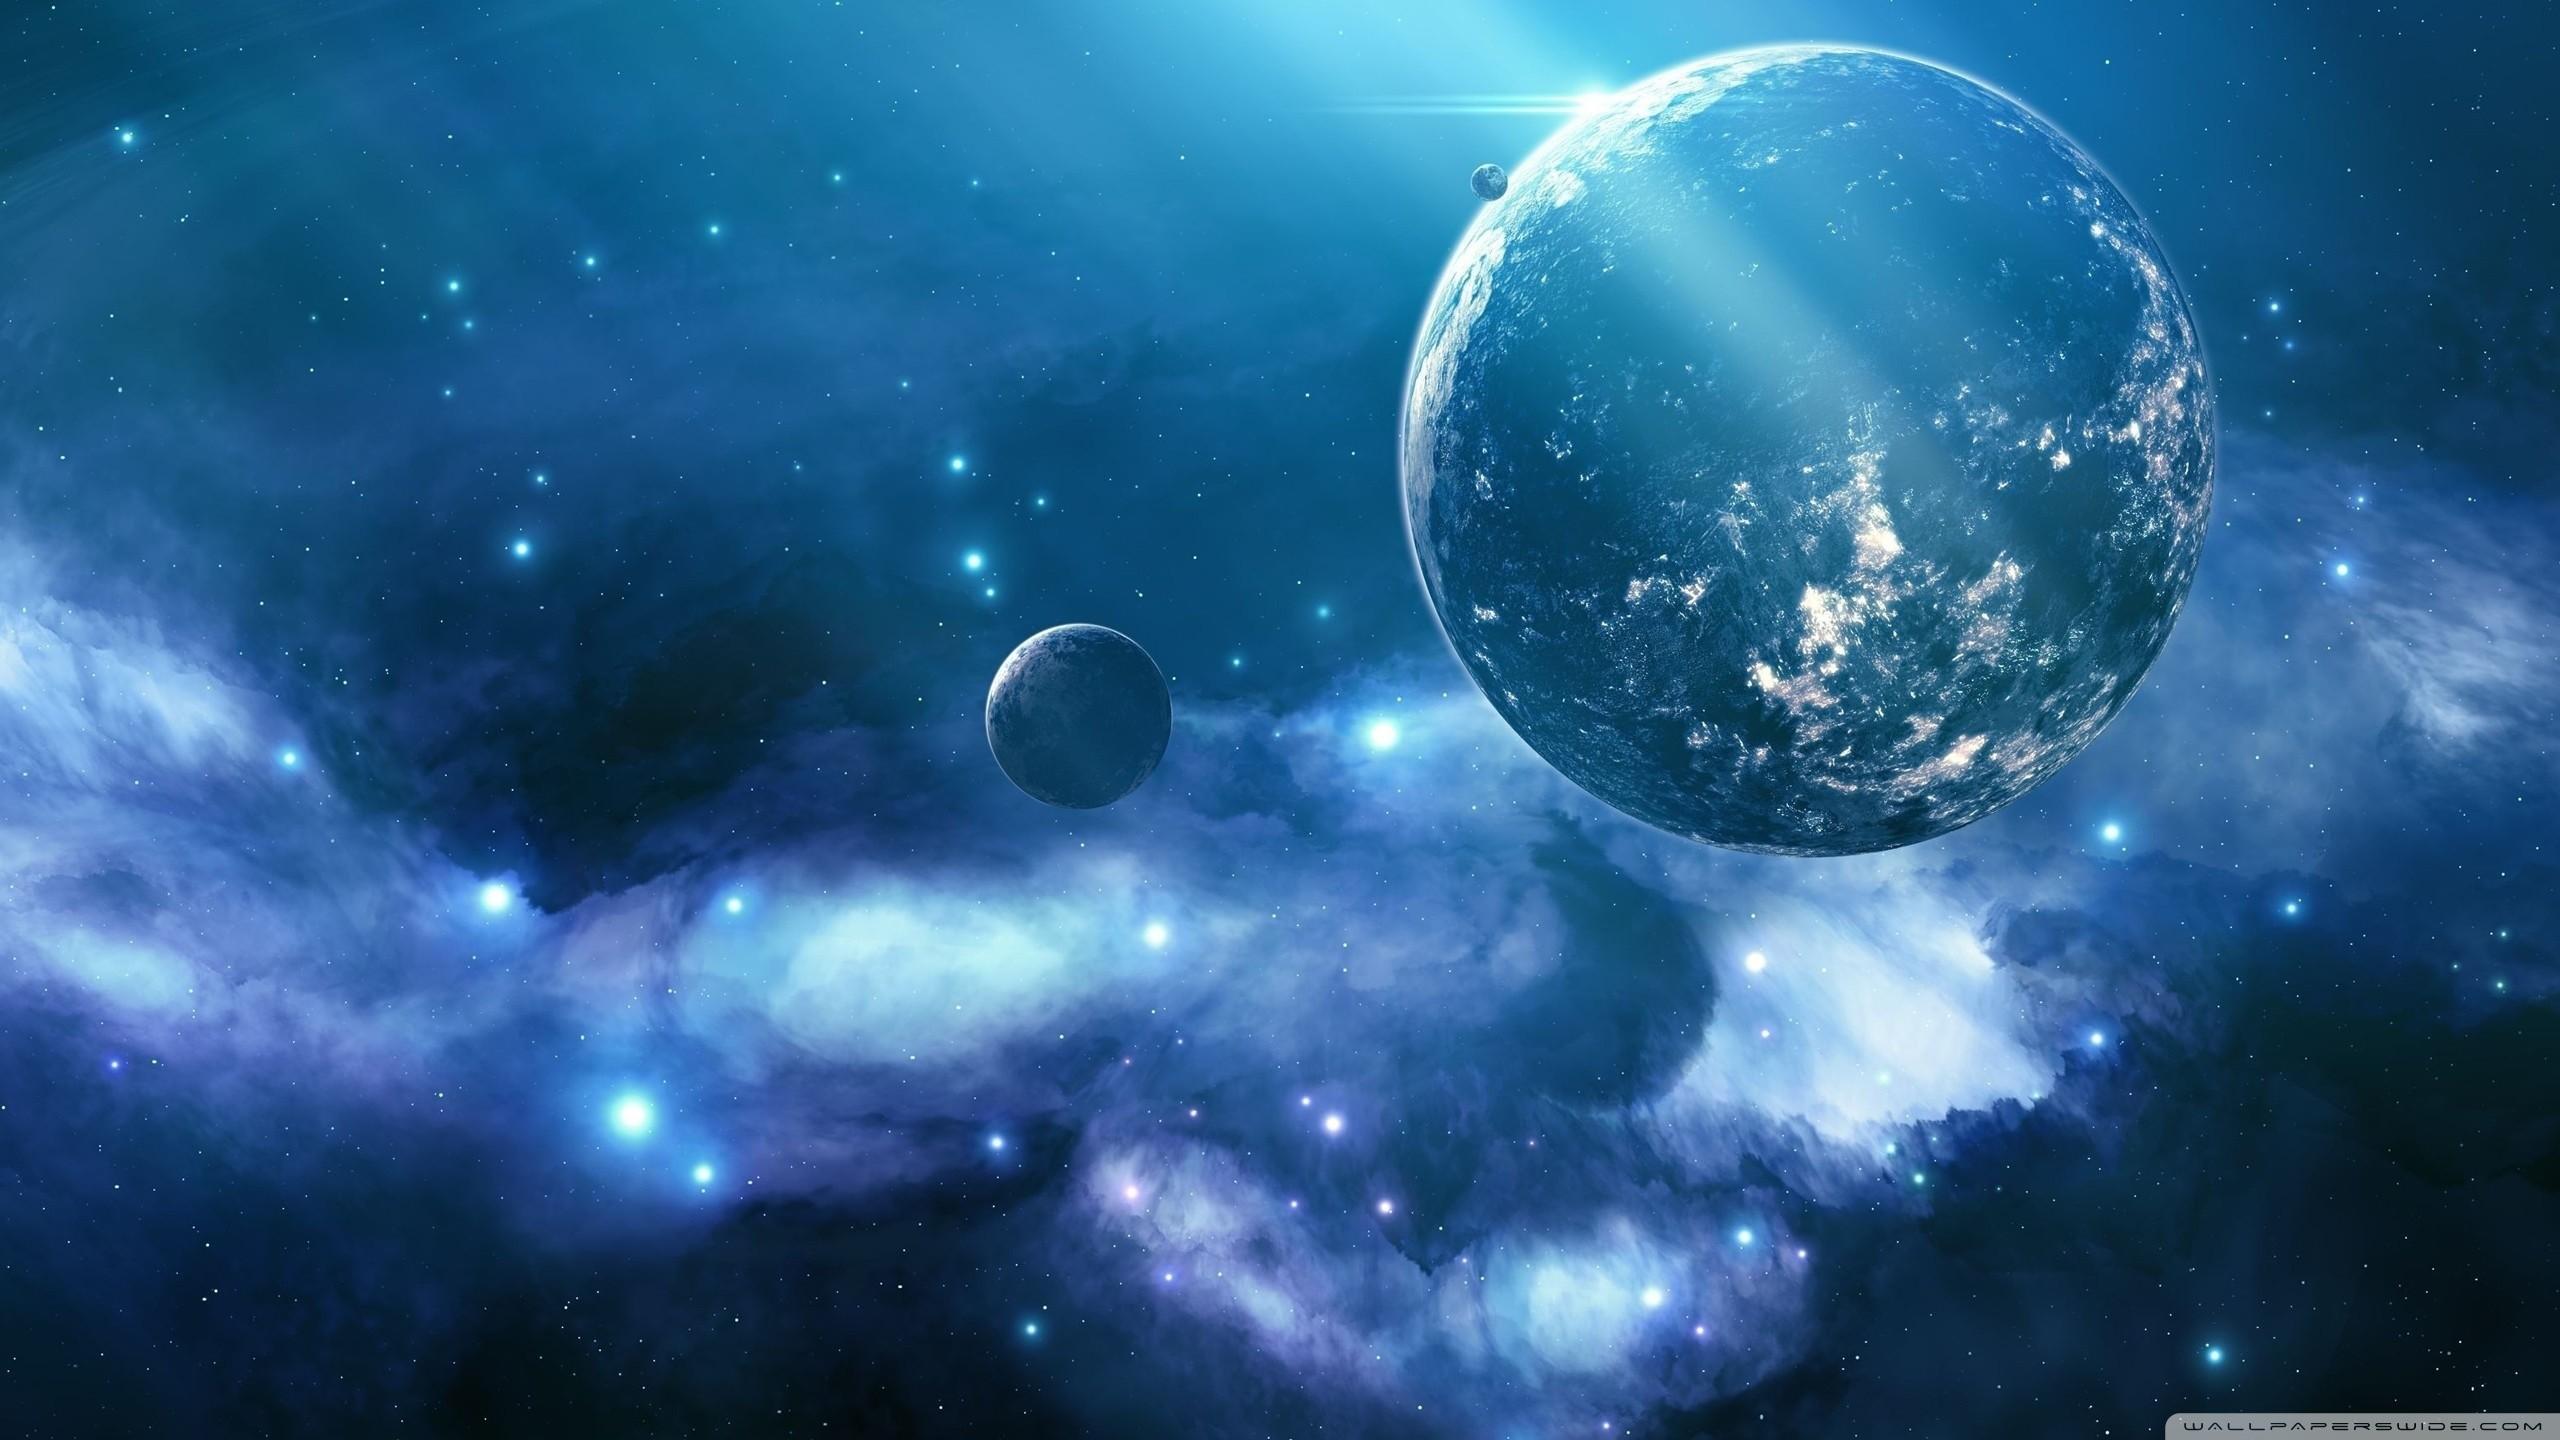 blue galaxy 2-wallpaper-2560x1440Youtube Channel Art Backgrounds Galaxy